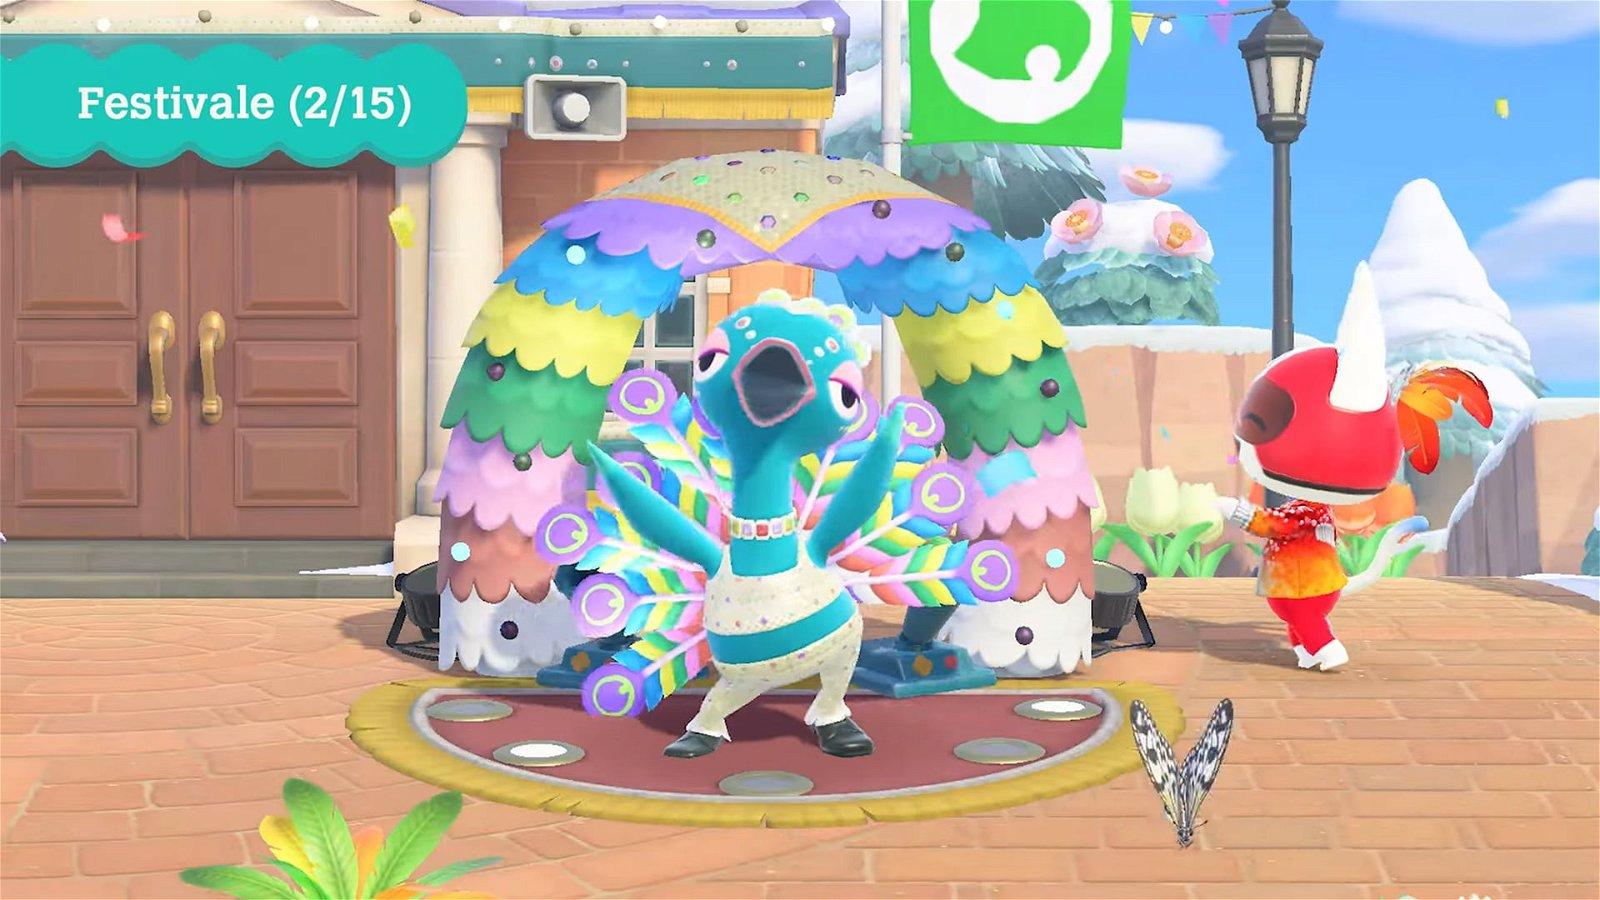 Animal Crossing New Horizons Celebrates Festivale February 15 2